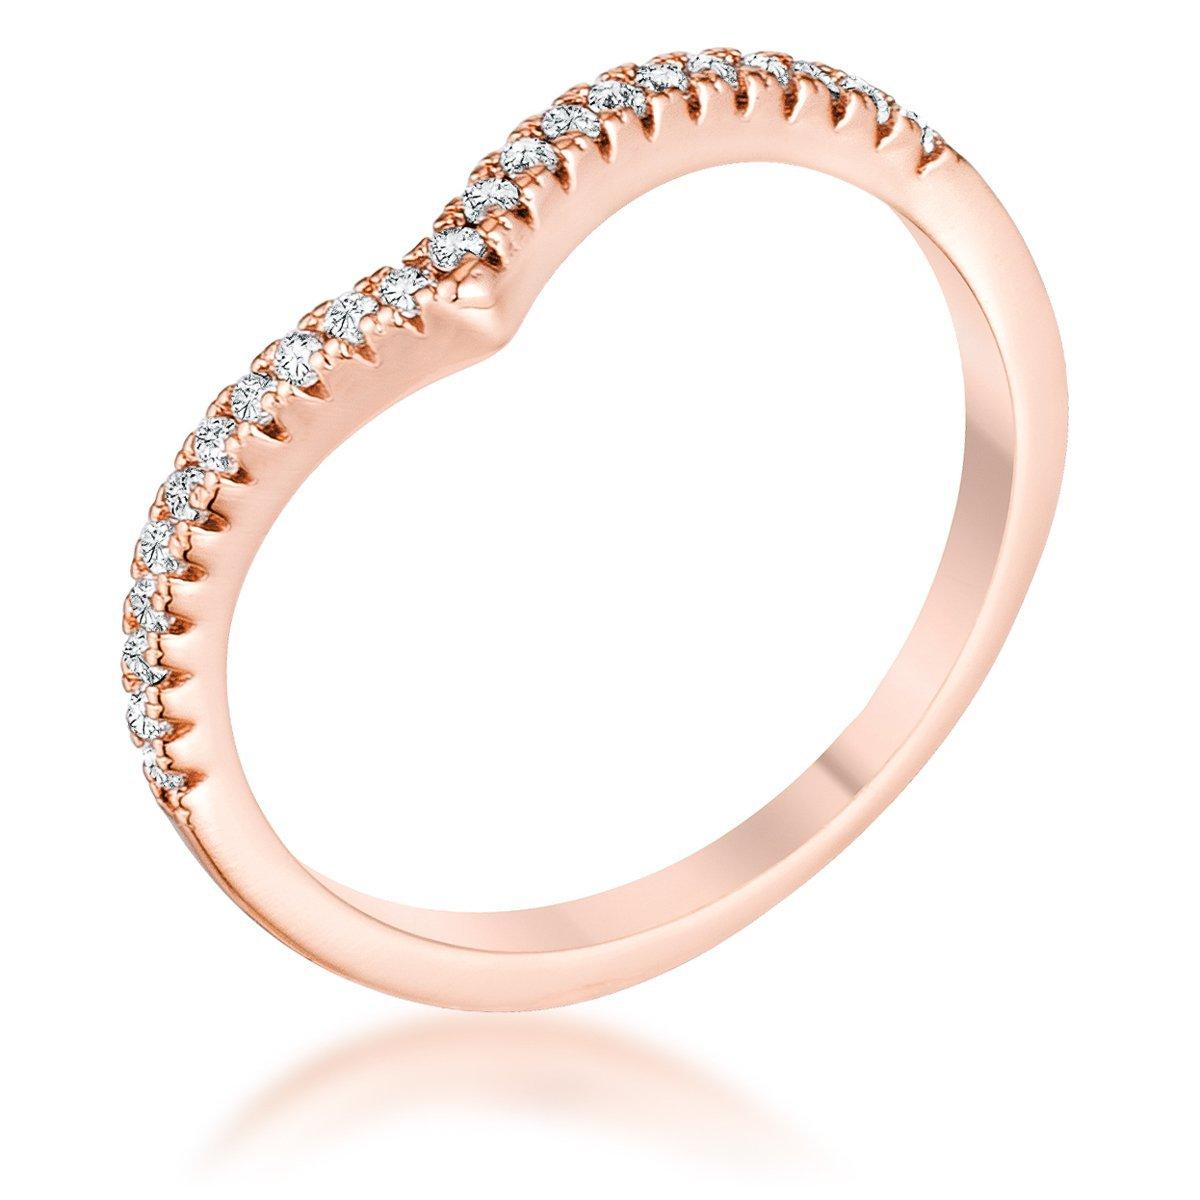 Freedom Fashion .22Ct Rose Goldtone Chevron Ring with CZ